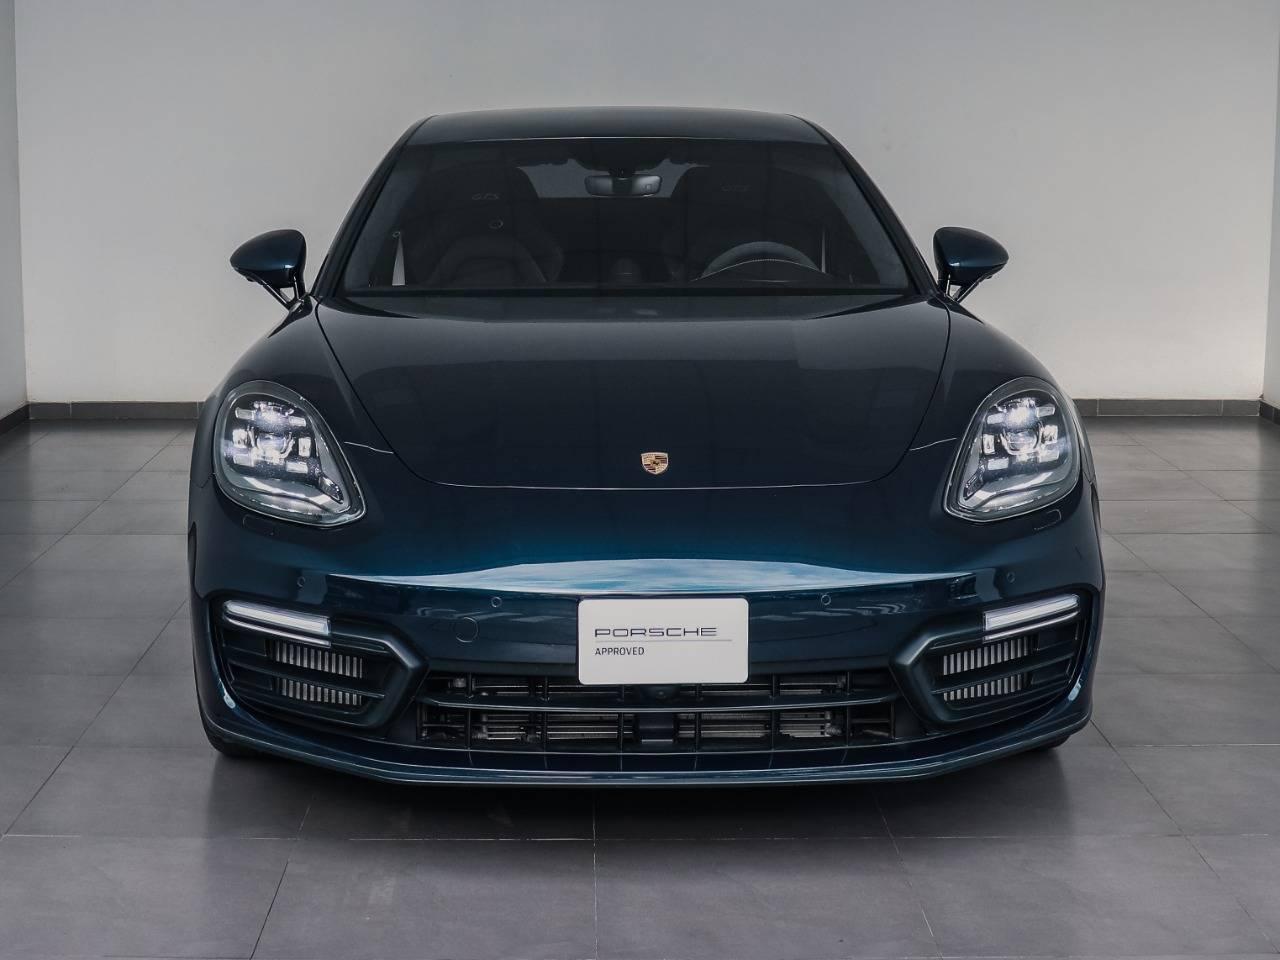 2019 Porsche Panamera GTS – 5